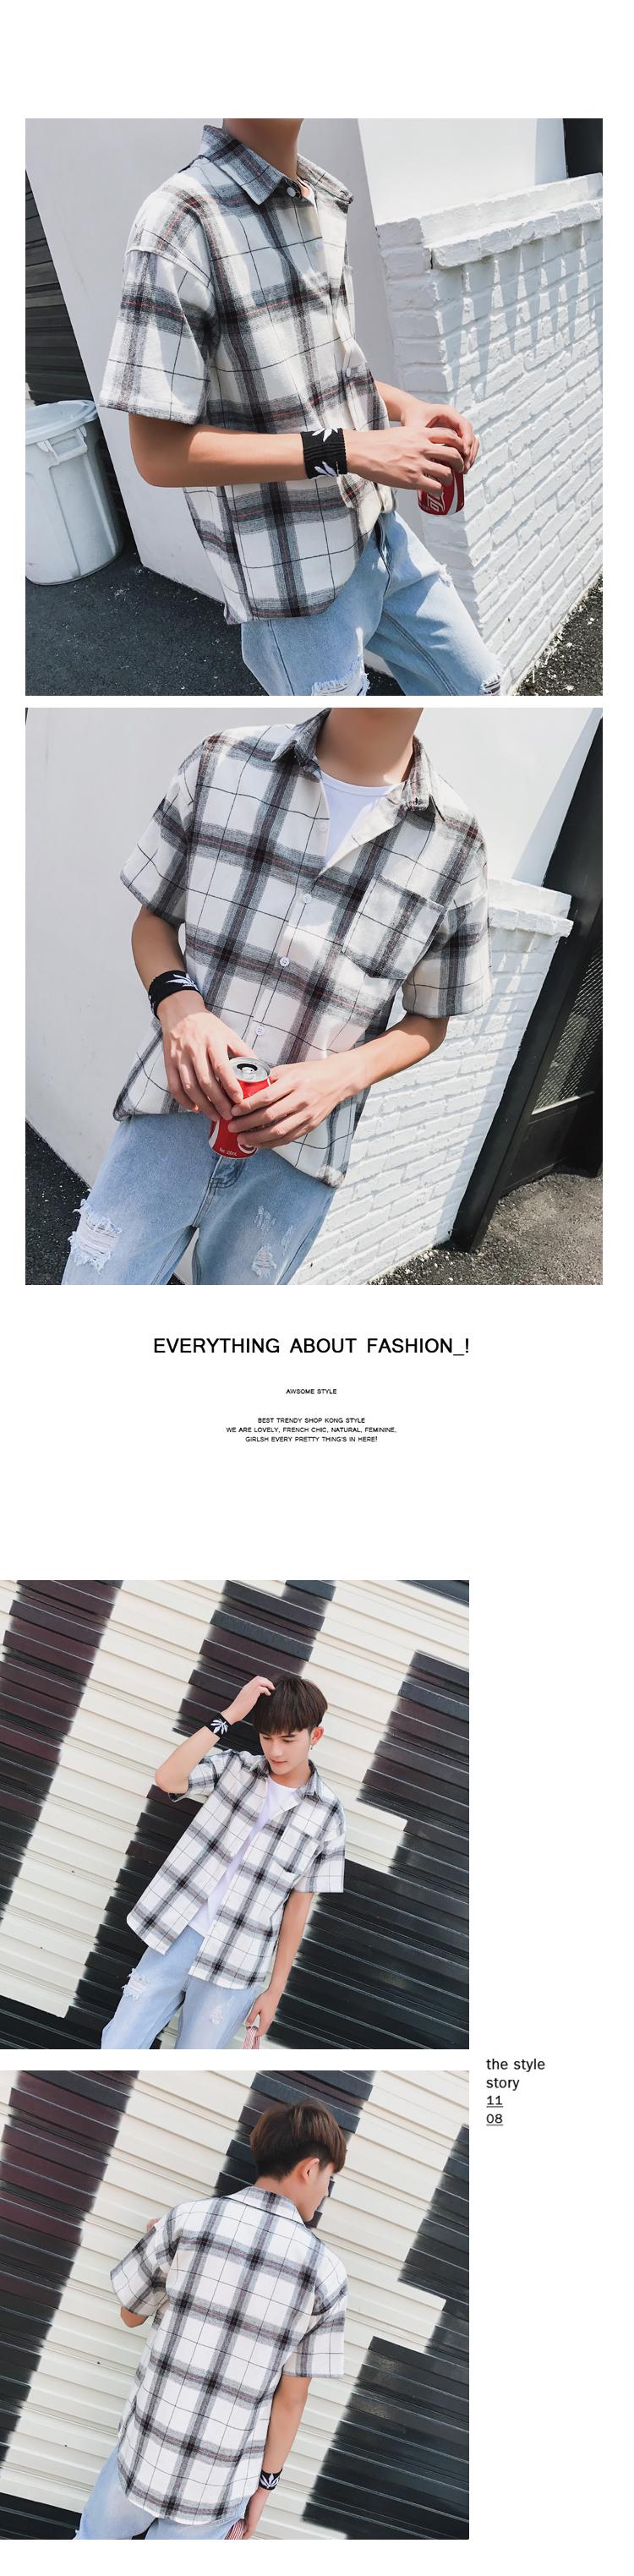 LEGIBLE Men Plaid Short Shirts 2019 Mens Harajuku Streetwear Casual Loose Hip Hop Half Sleeve Shirt Male Fashion 12